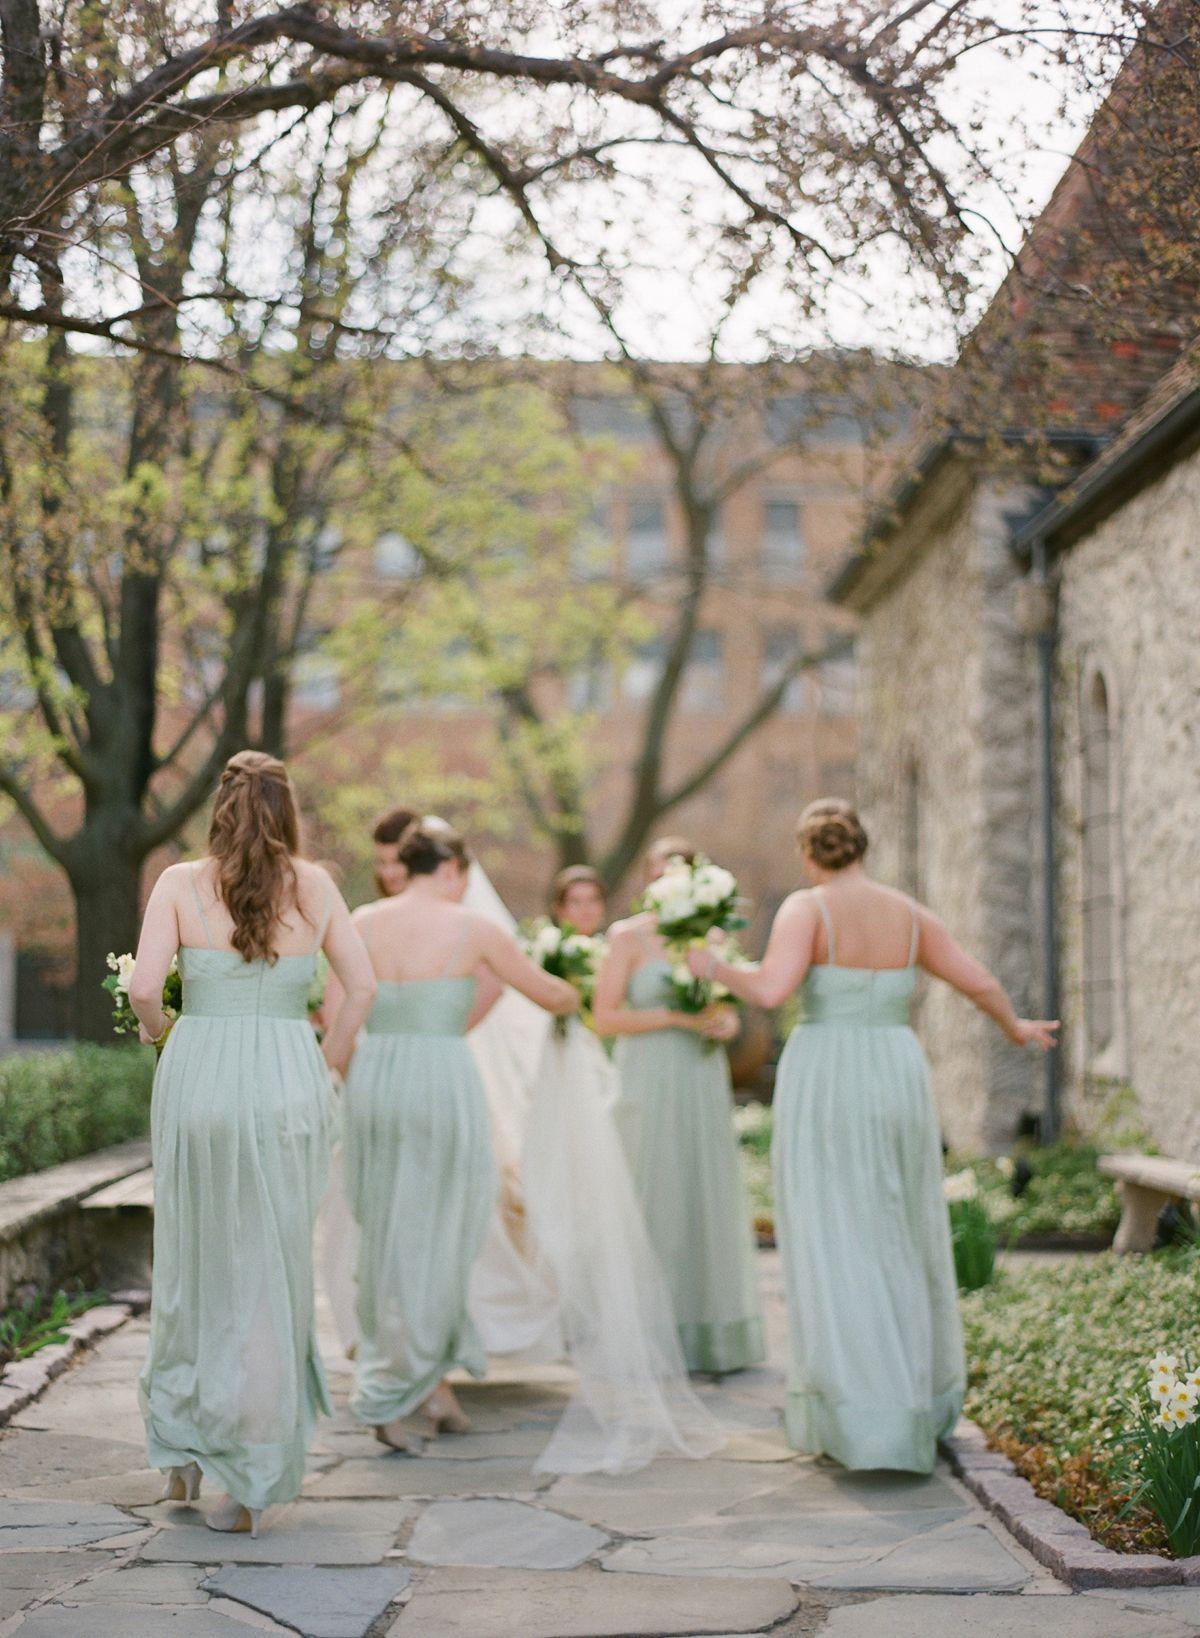 Elegant Milwaukee Wedding Lauren Ryan Floral Bridesmaid Dresses Bridal Party Attire Bridesmaid Colors